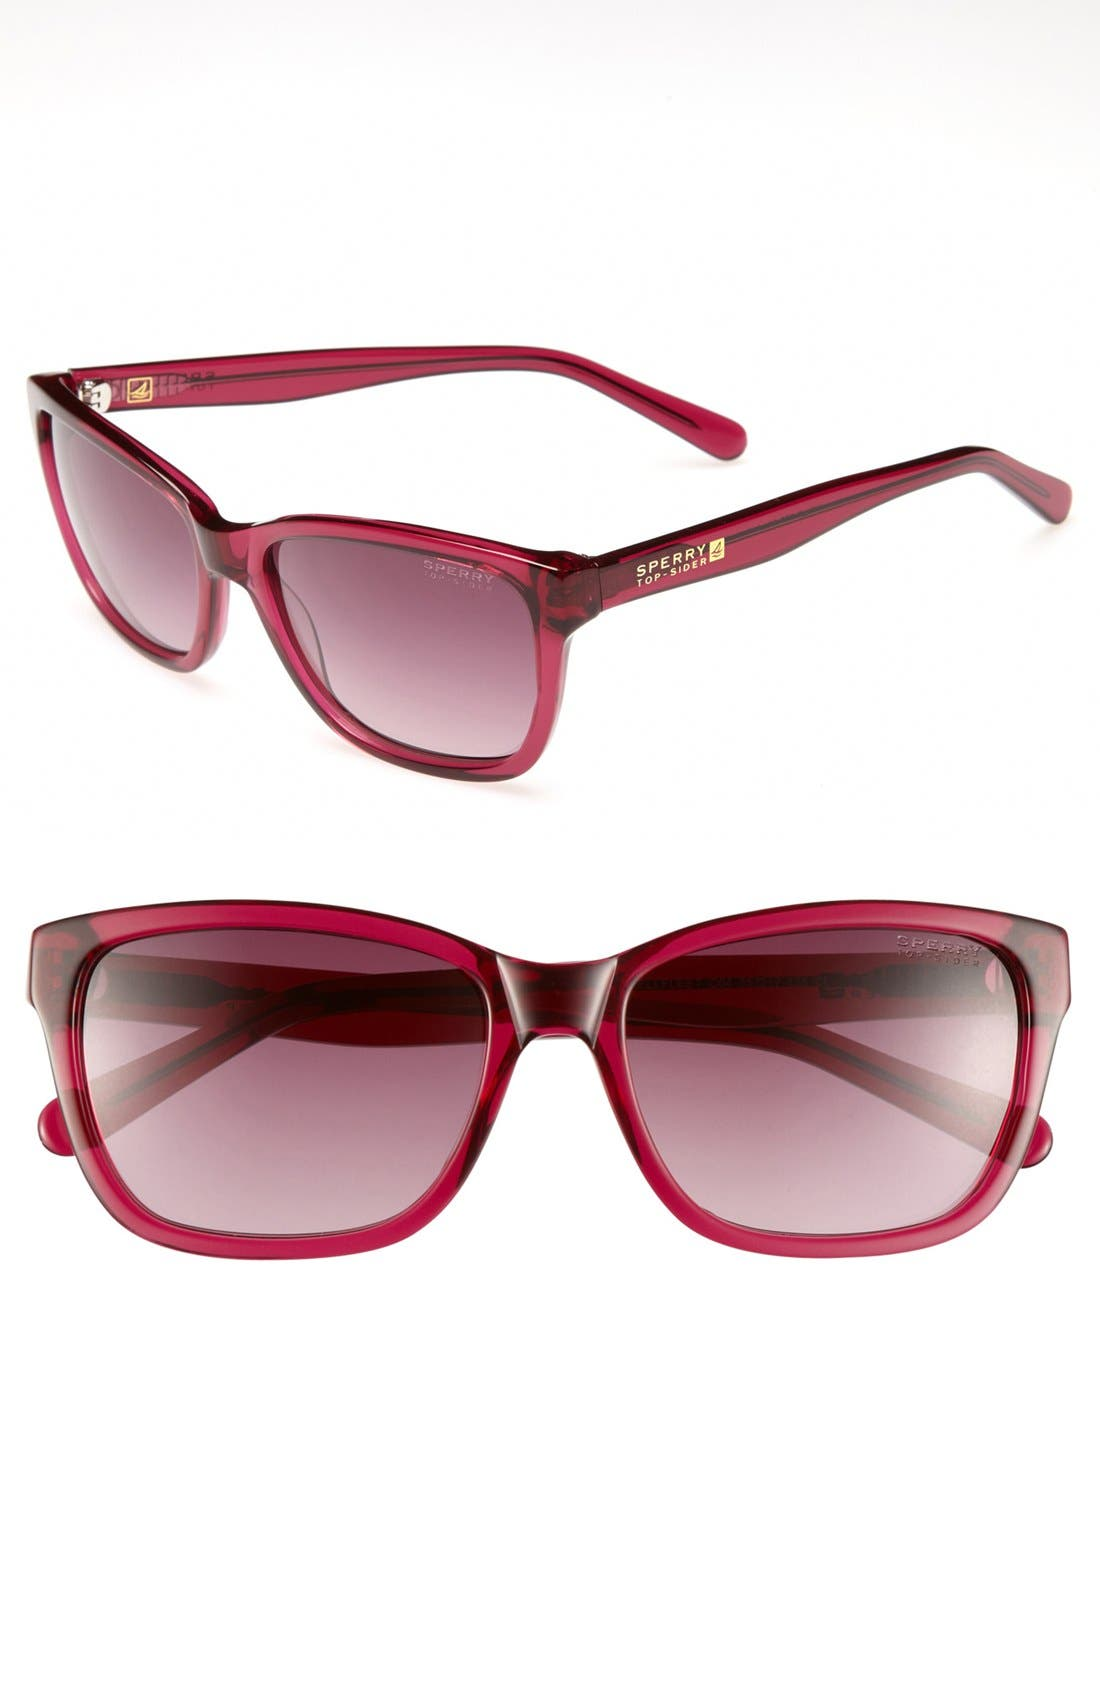 Main Image - Sperry Top-Sider® 'Wellfleet' 55mm Sunglasses (Online Only)